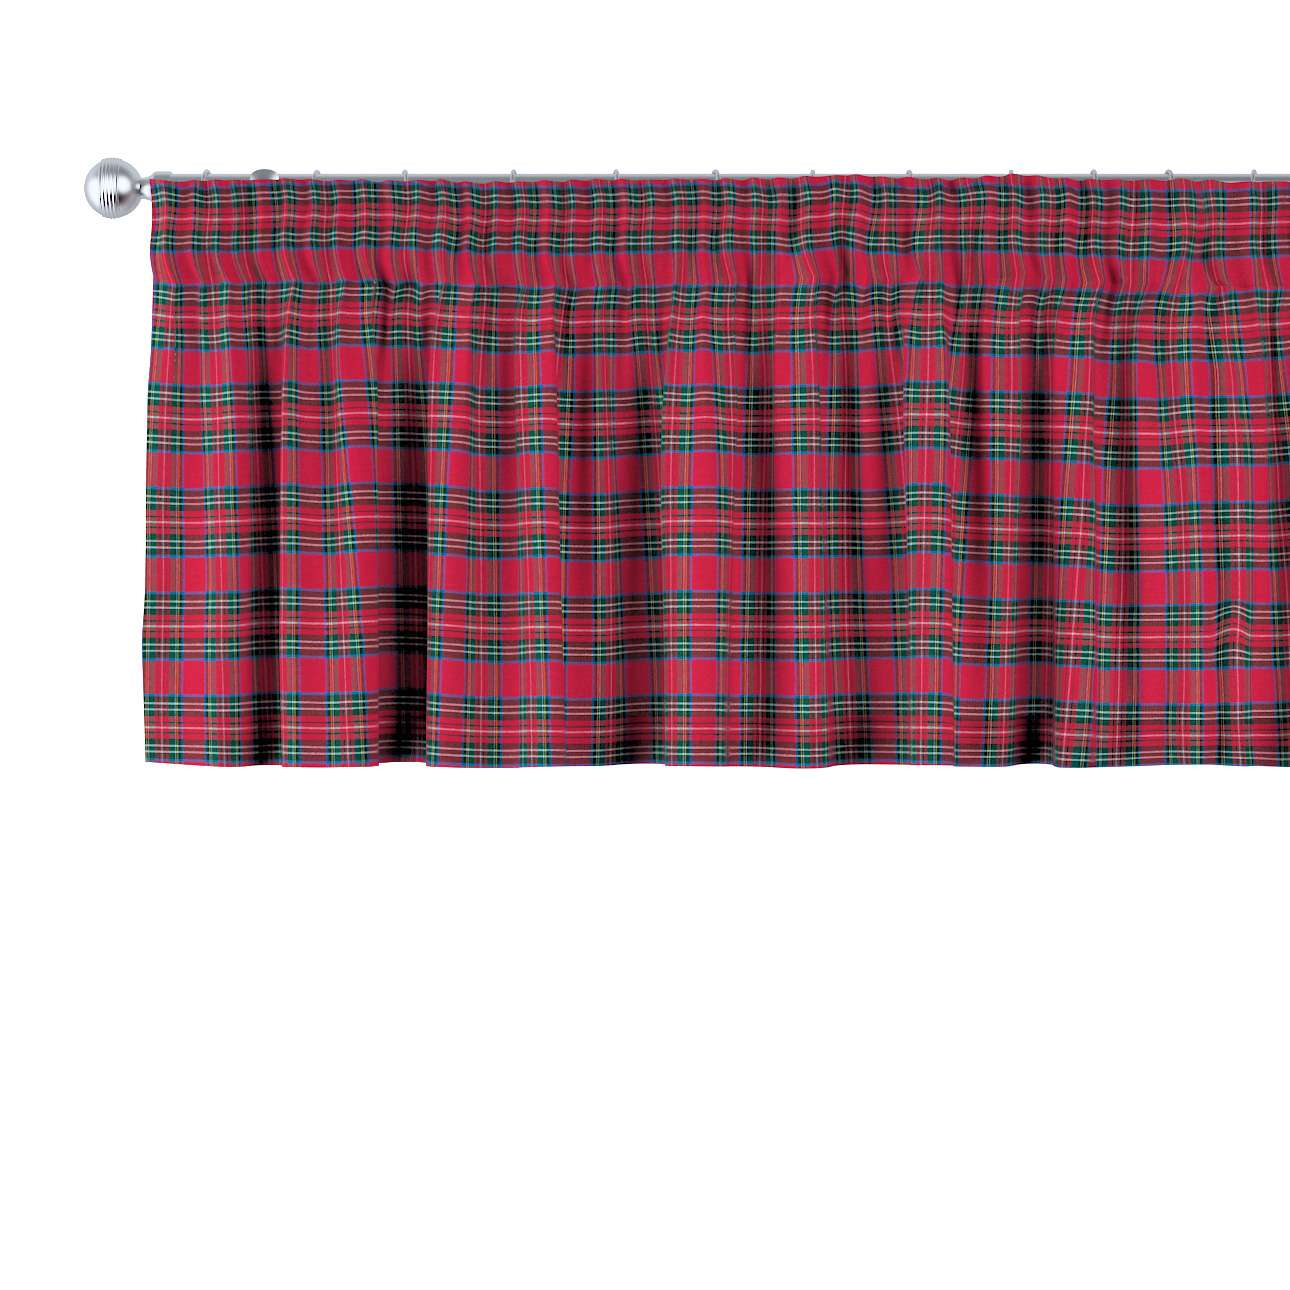 Gardinkappe med rynkebånd 130 x 40 cm fra kollektionen Bristol, Stof: 126-29